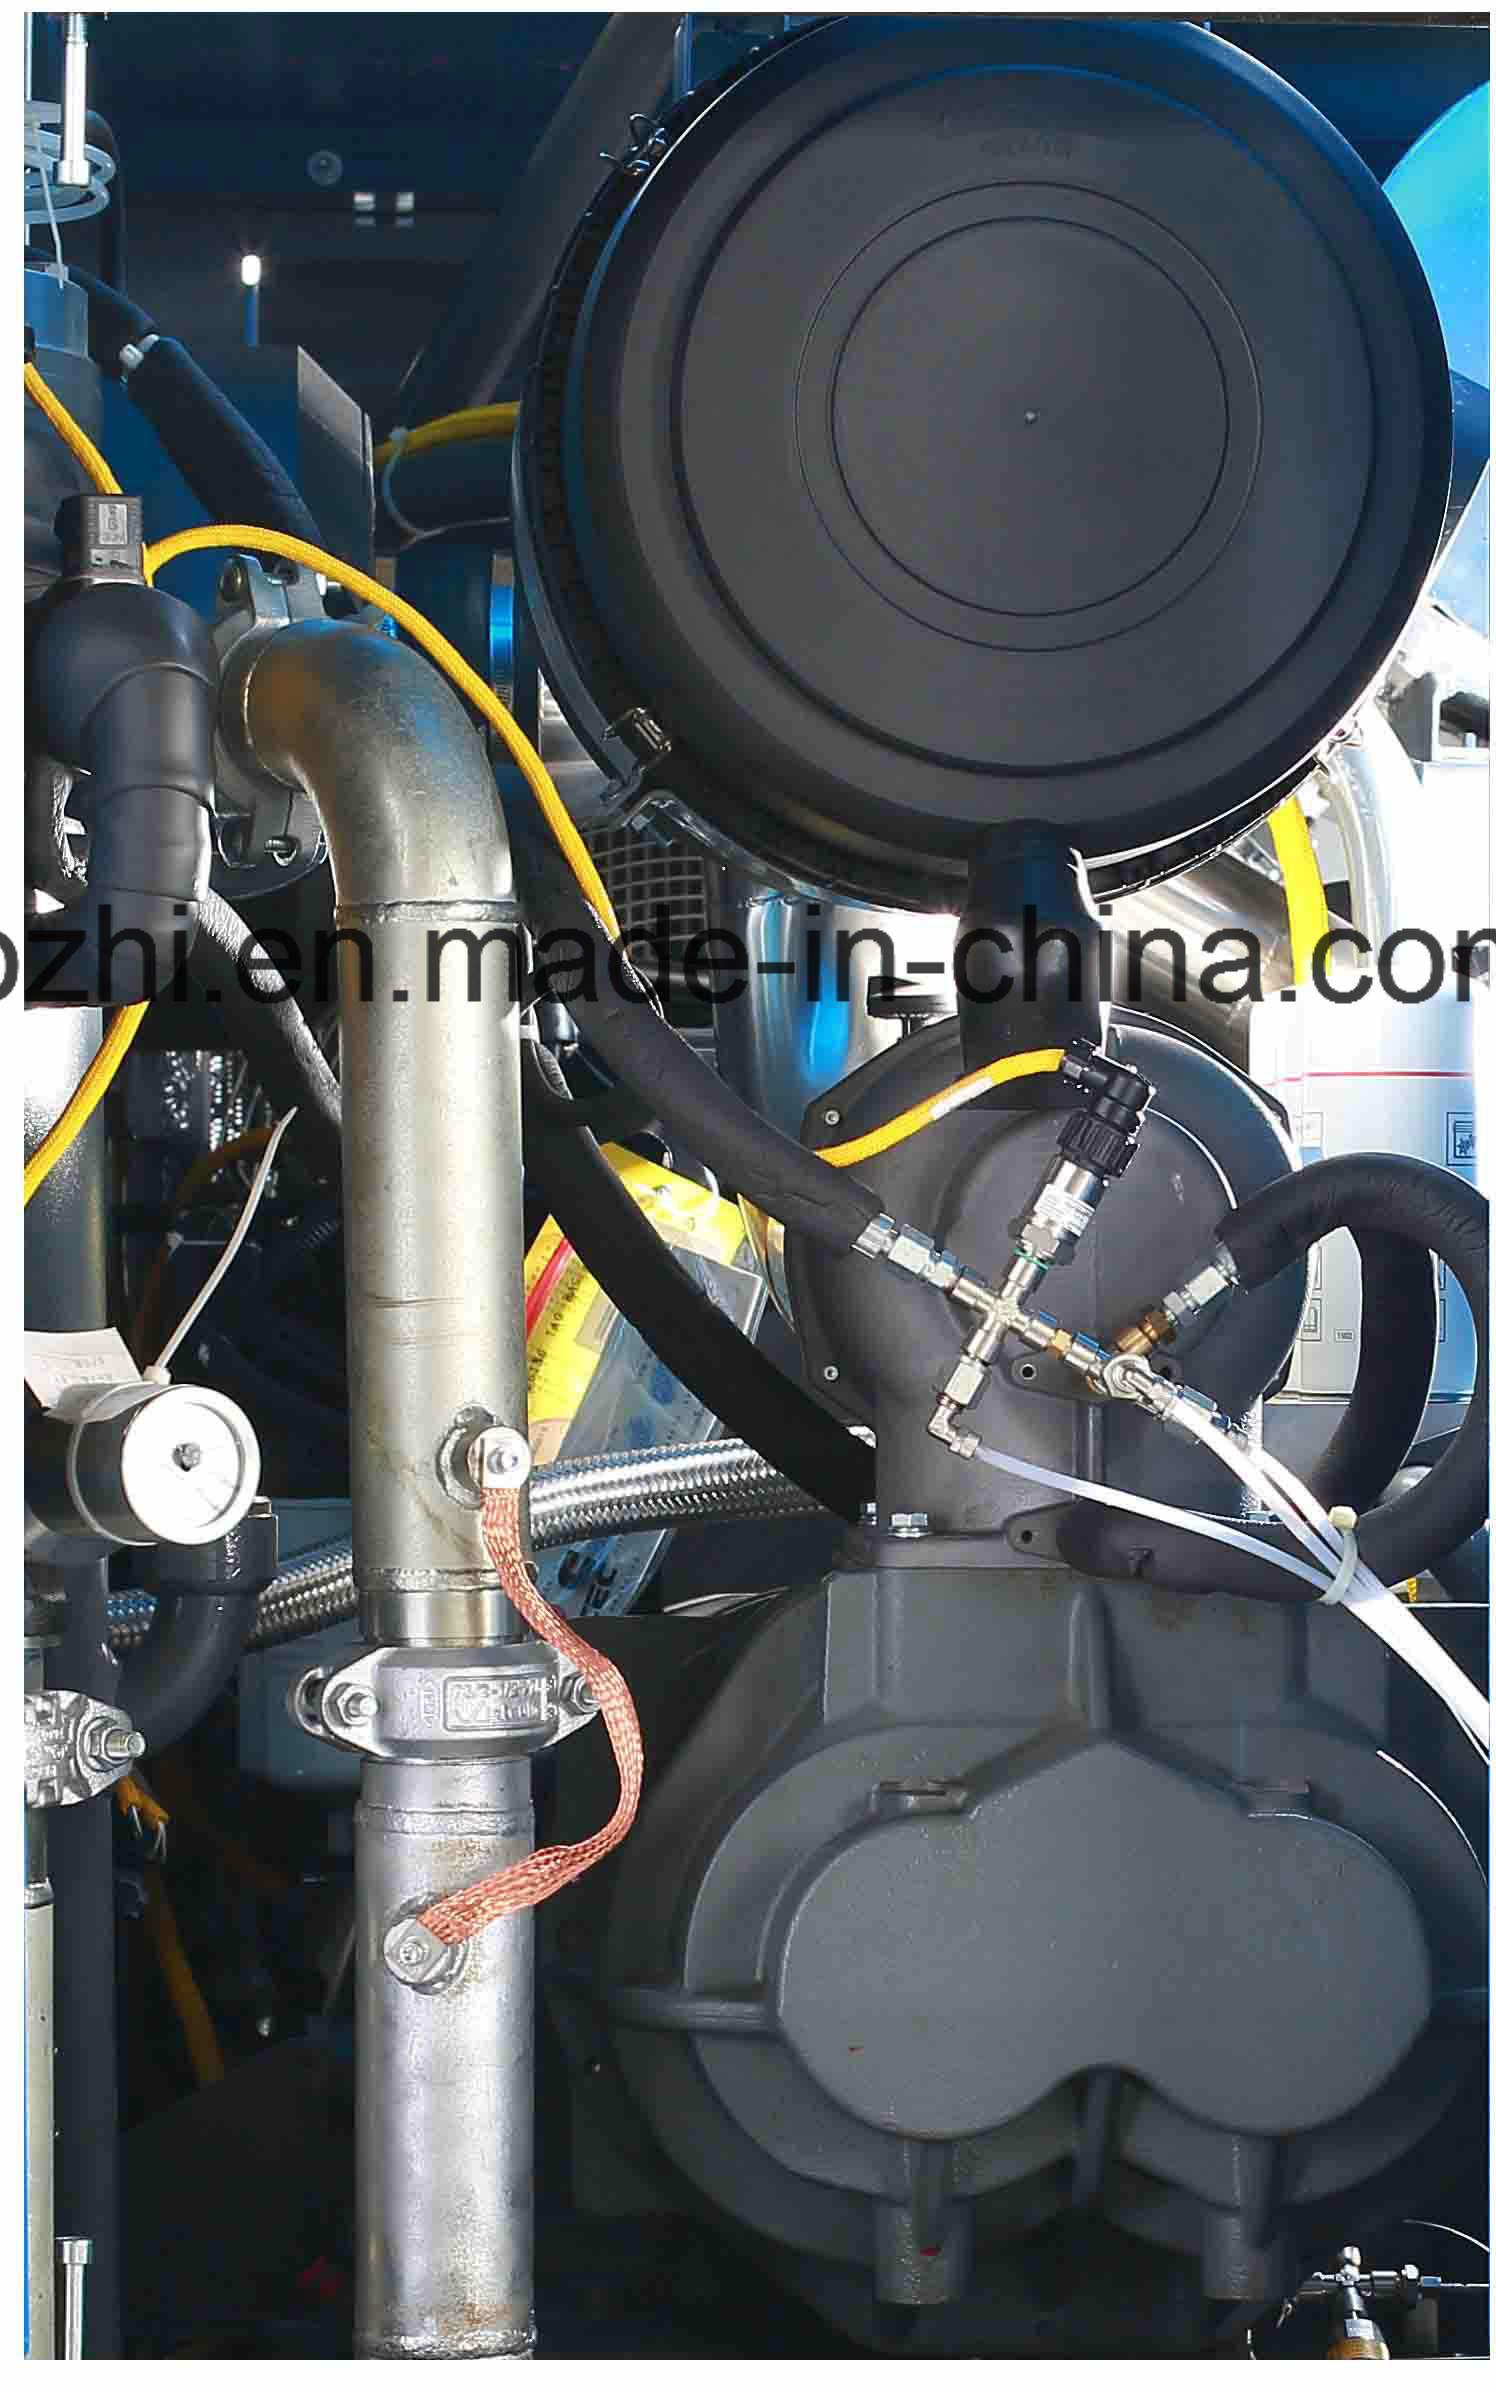 Atlas Copco Liutech 636cfm 20bar Portable Screw Air Compressor